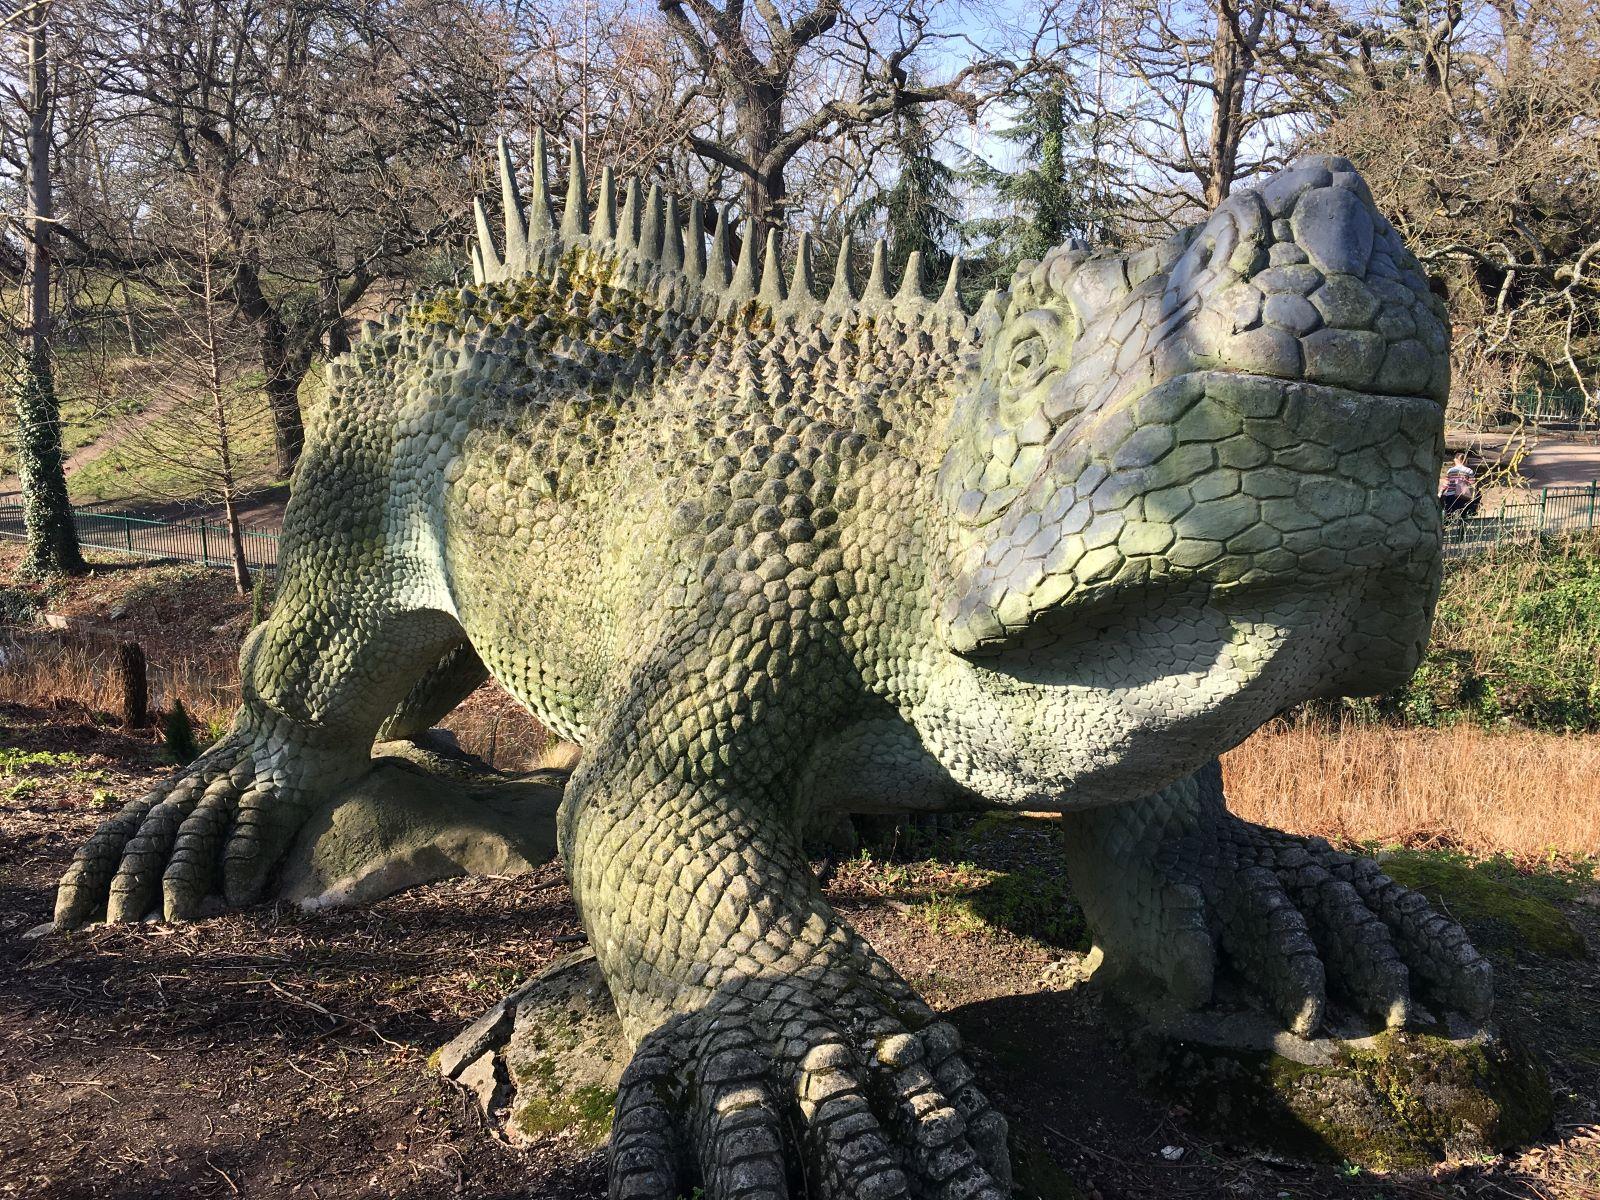 Hylaeosaurus_Crees_2019